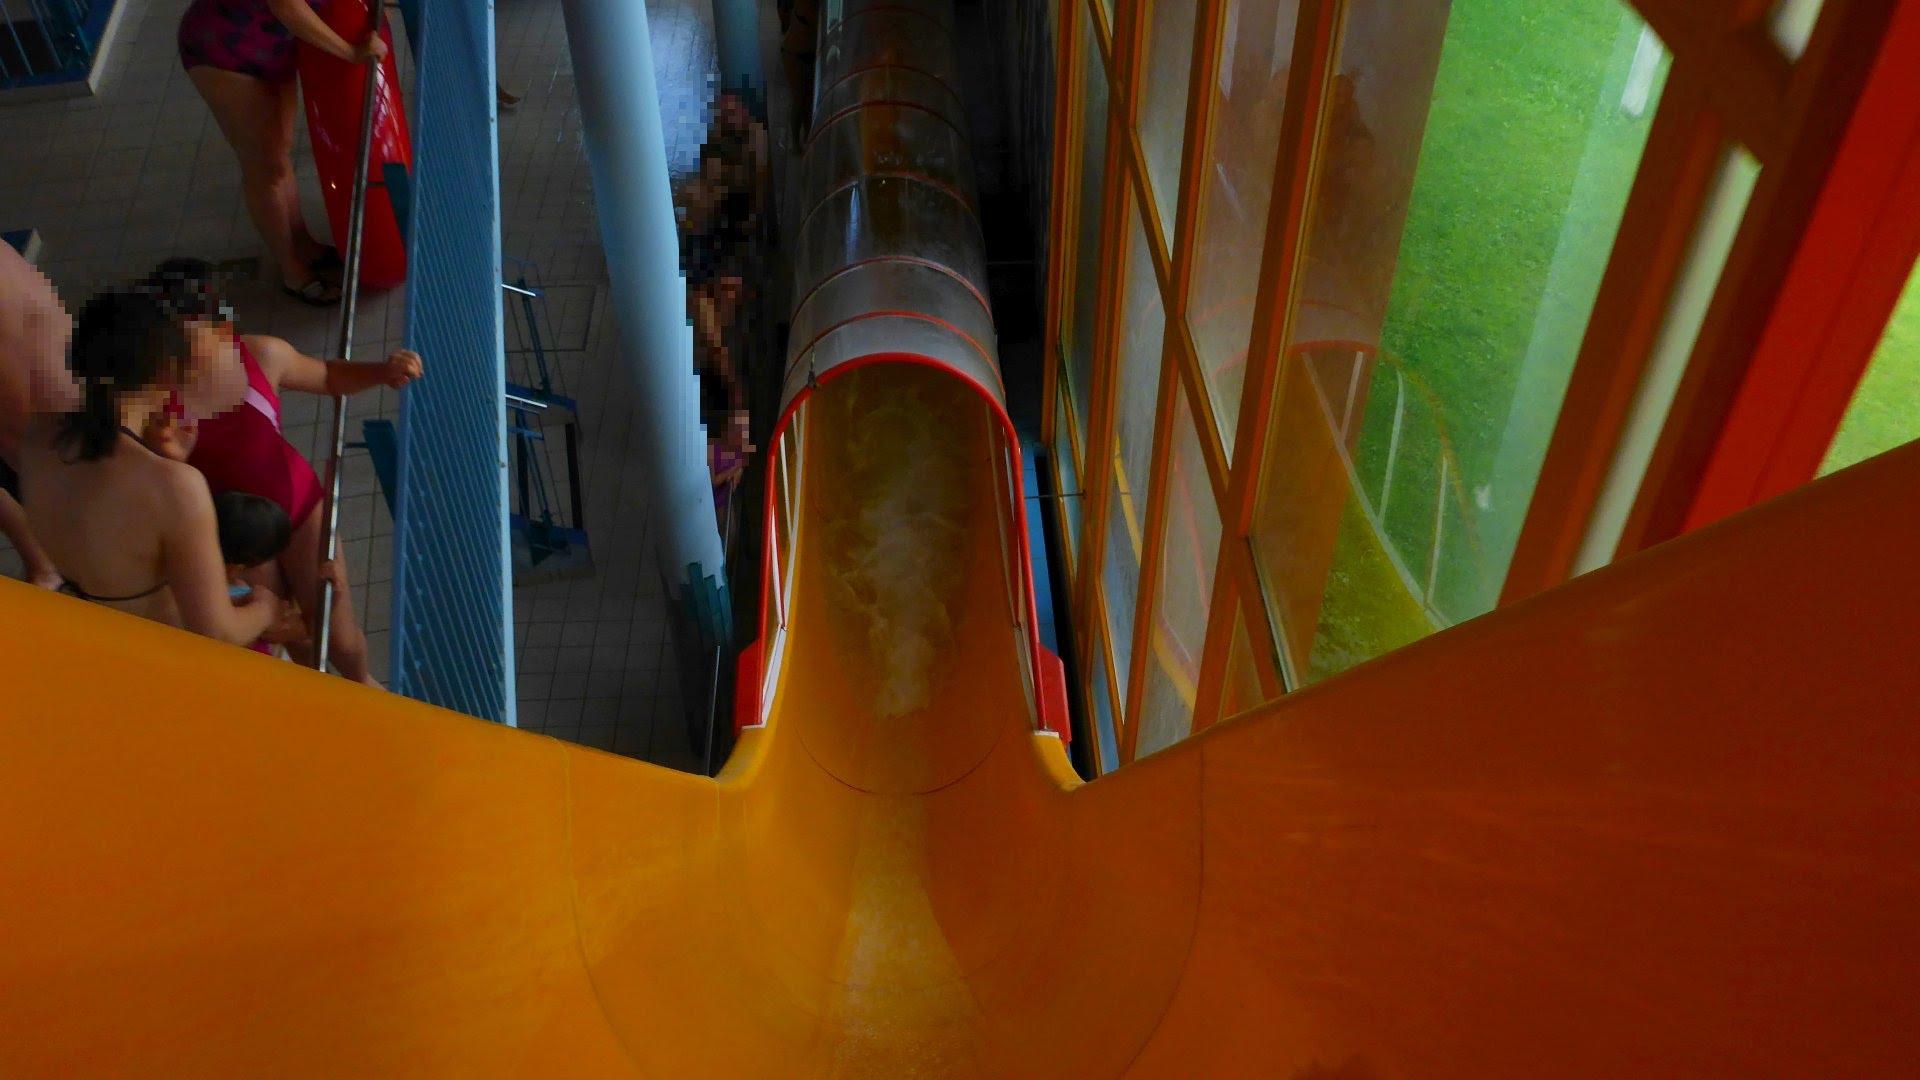 Kamikaze Freefall-Slide | Wonnemar Sonthofen